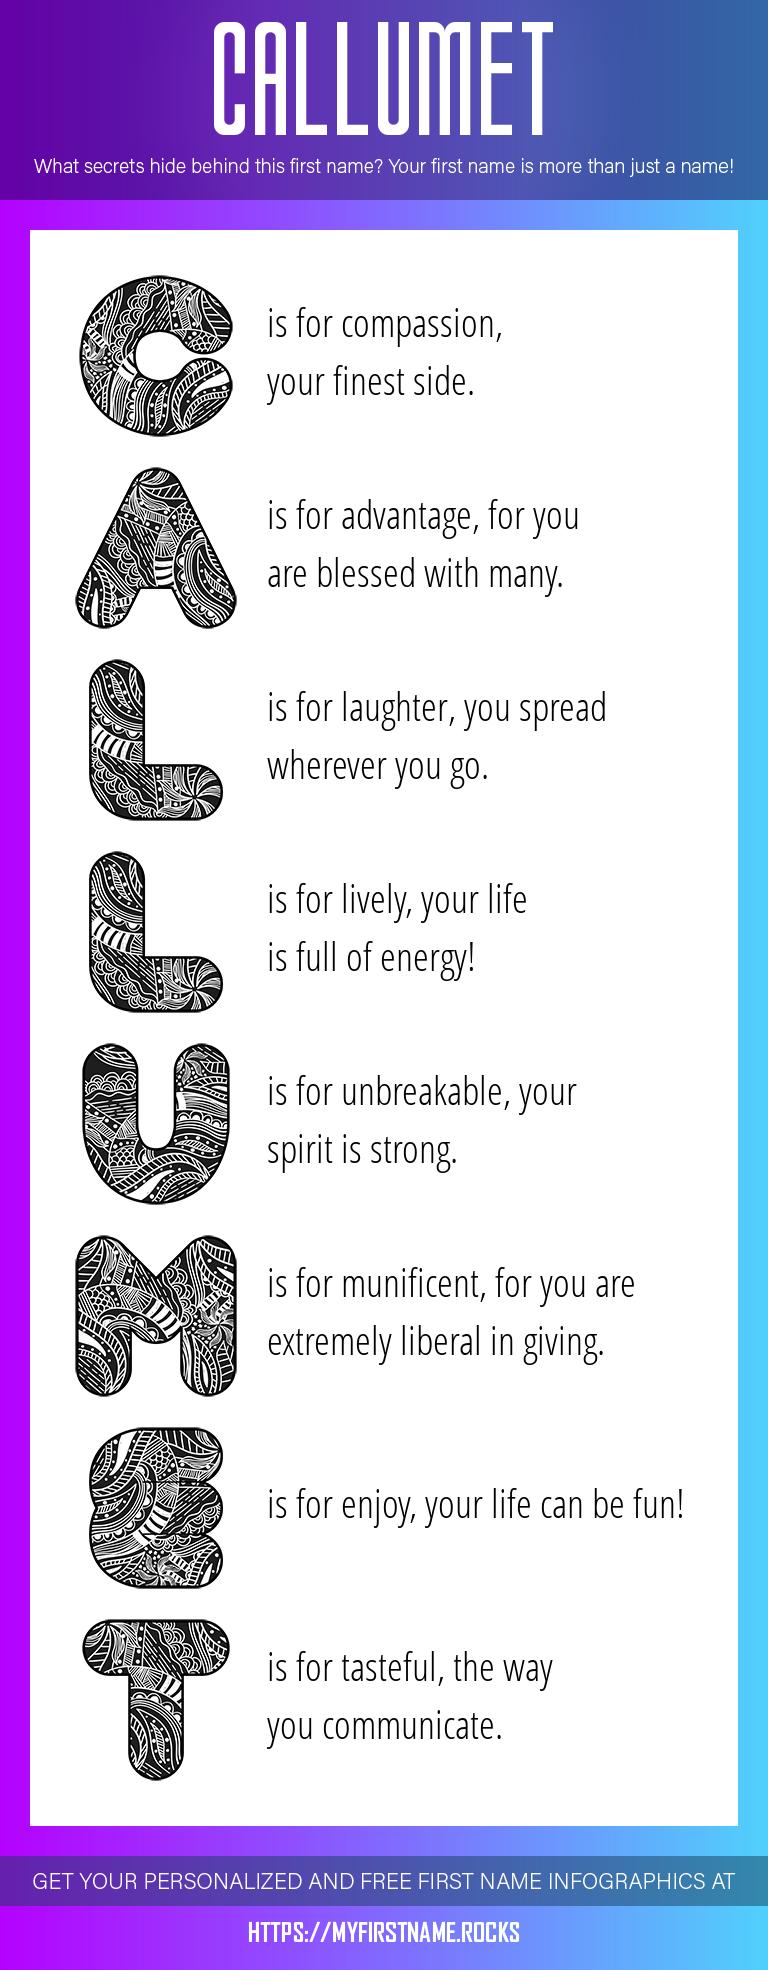 Callumet Infographics